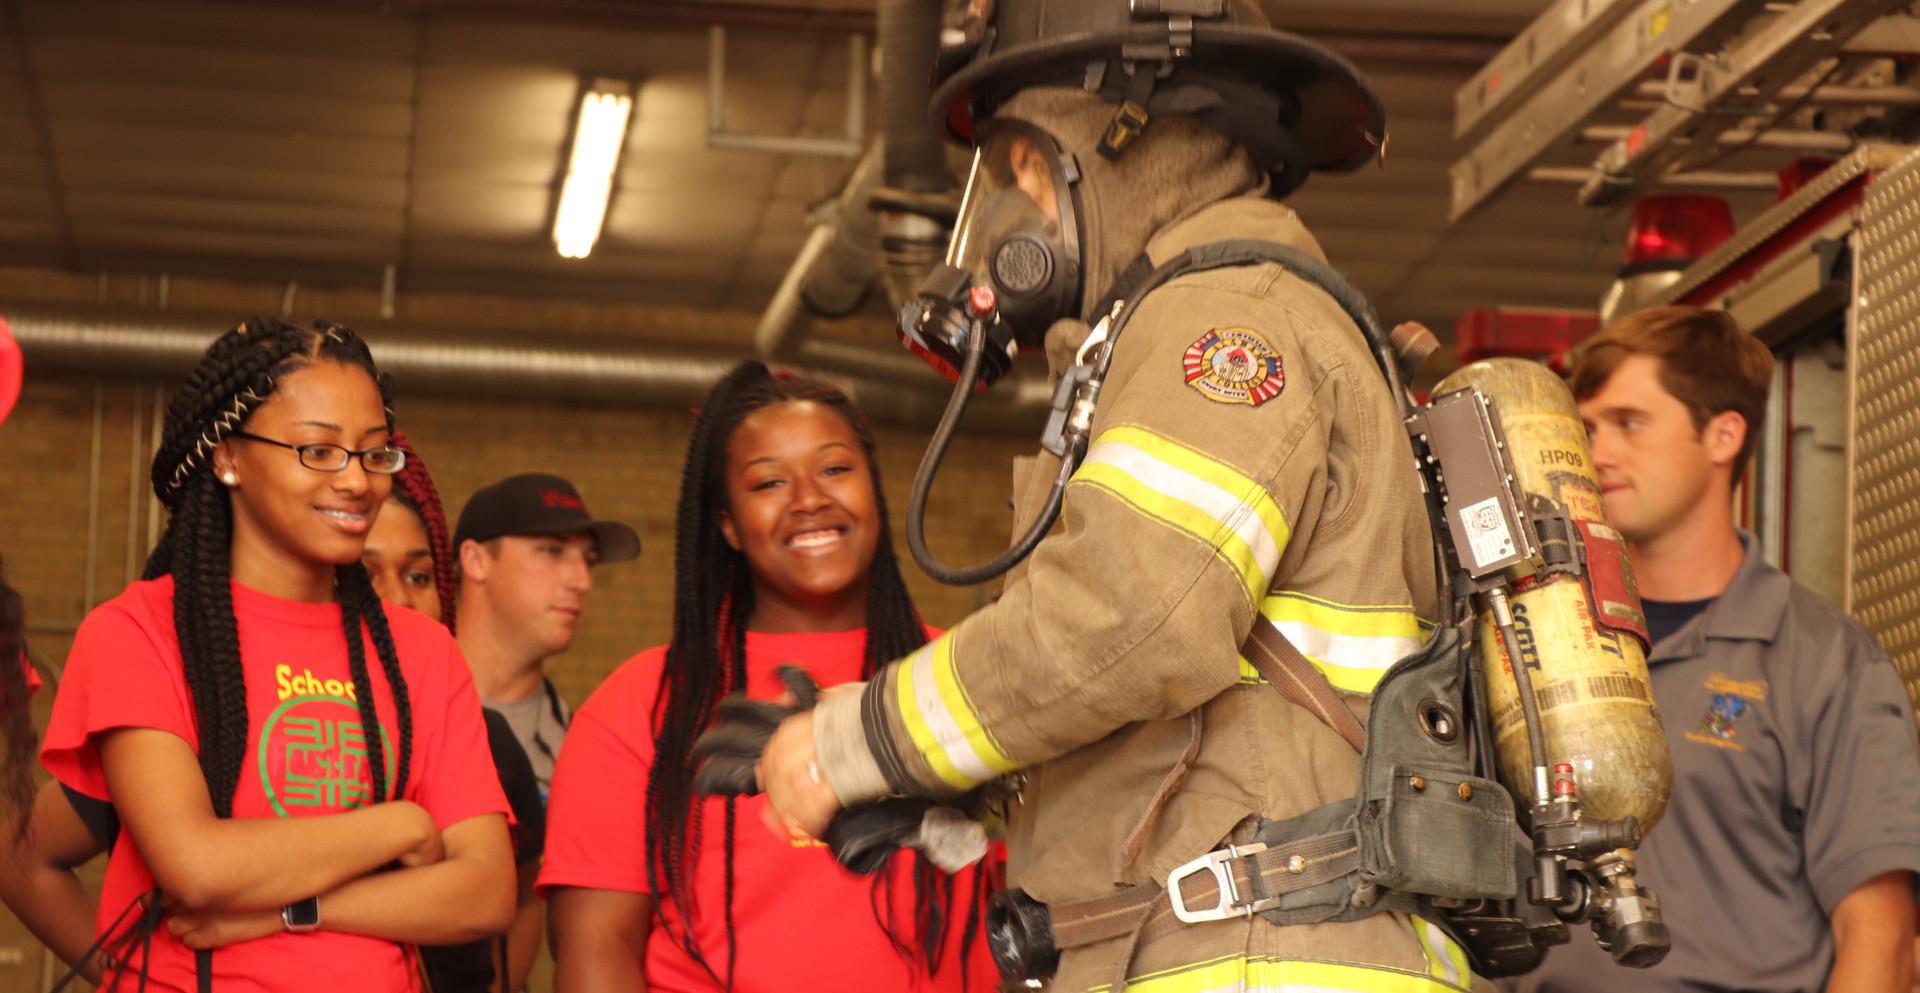 Birmingham Fire Department